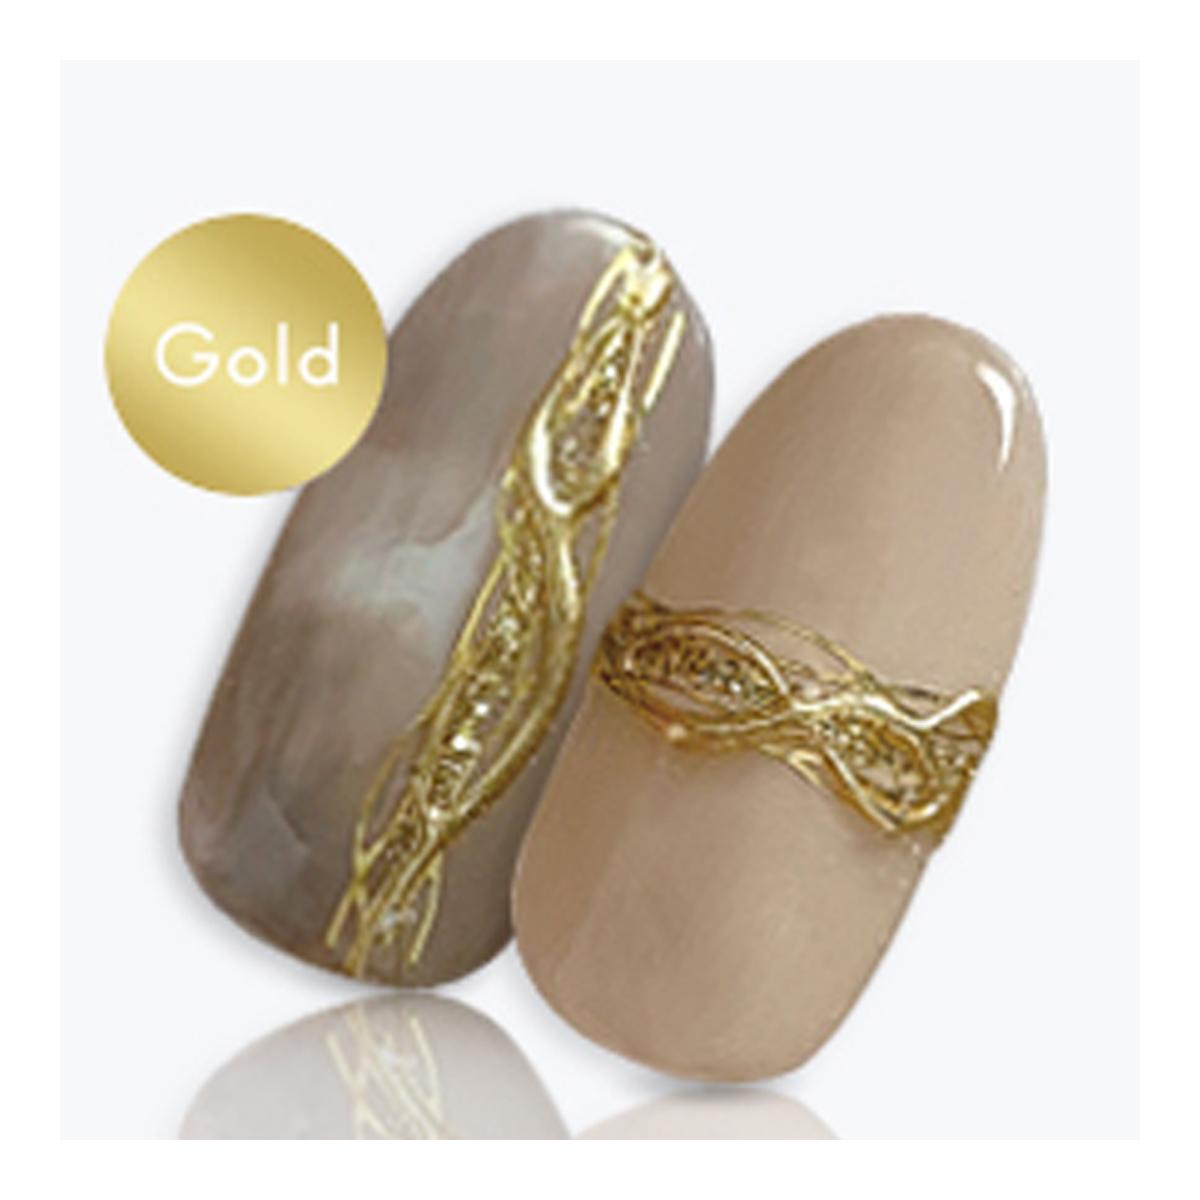 Sha-Nail Plus(写ネイルプラス):ネイルシール  ウェーブライン ゴールド/wave line -Gold-/RUMI-PWL01